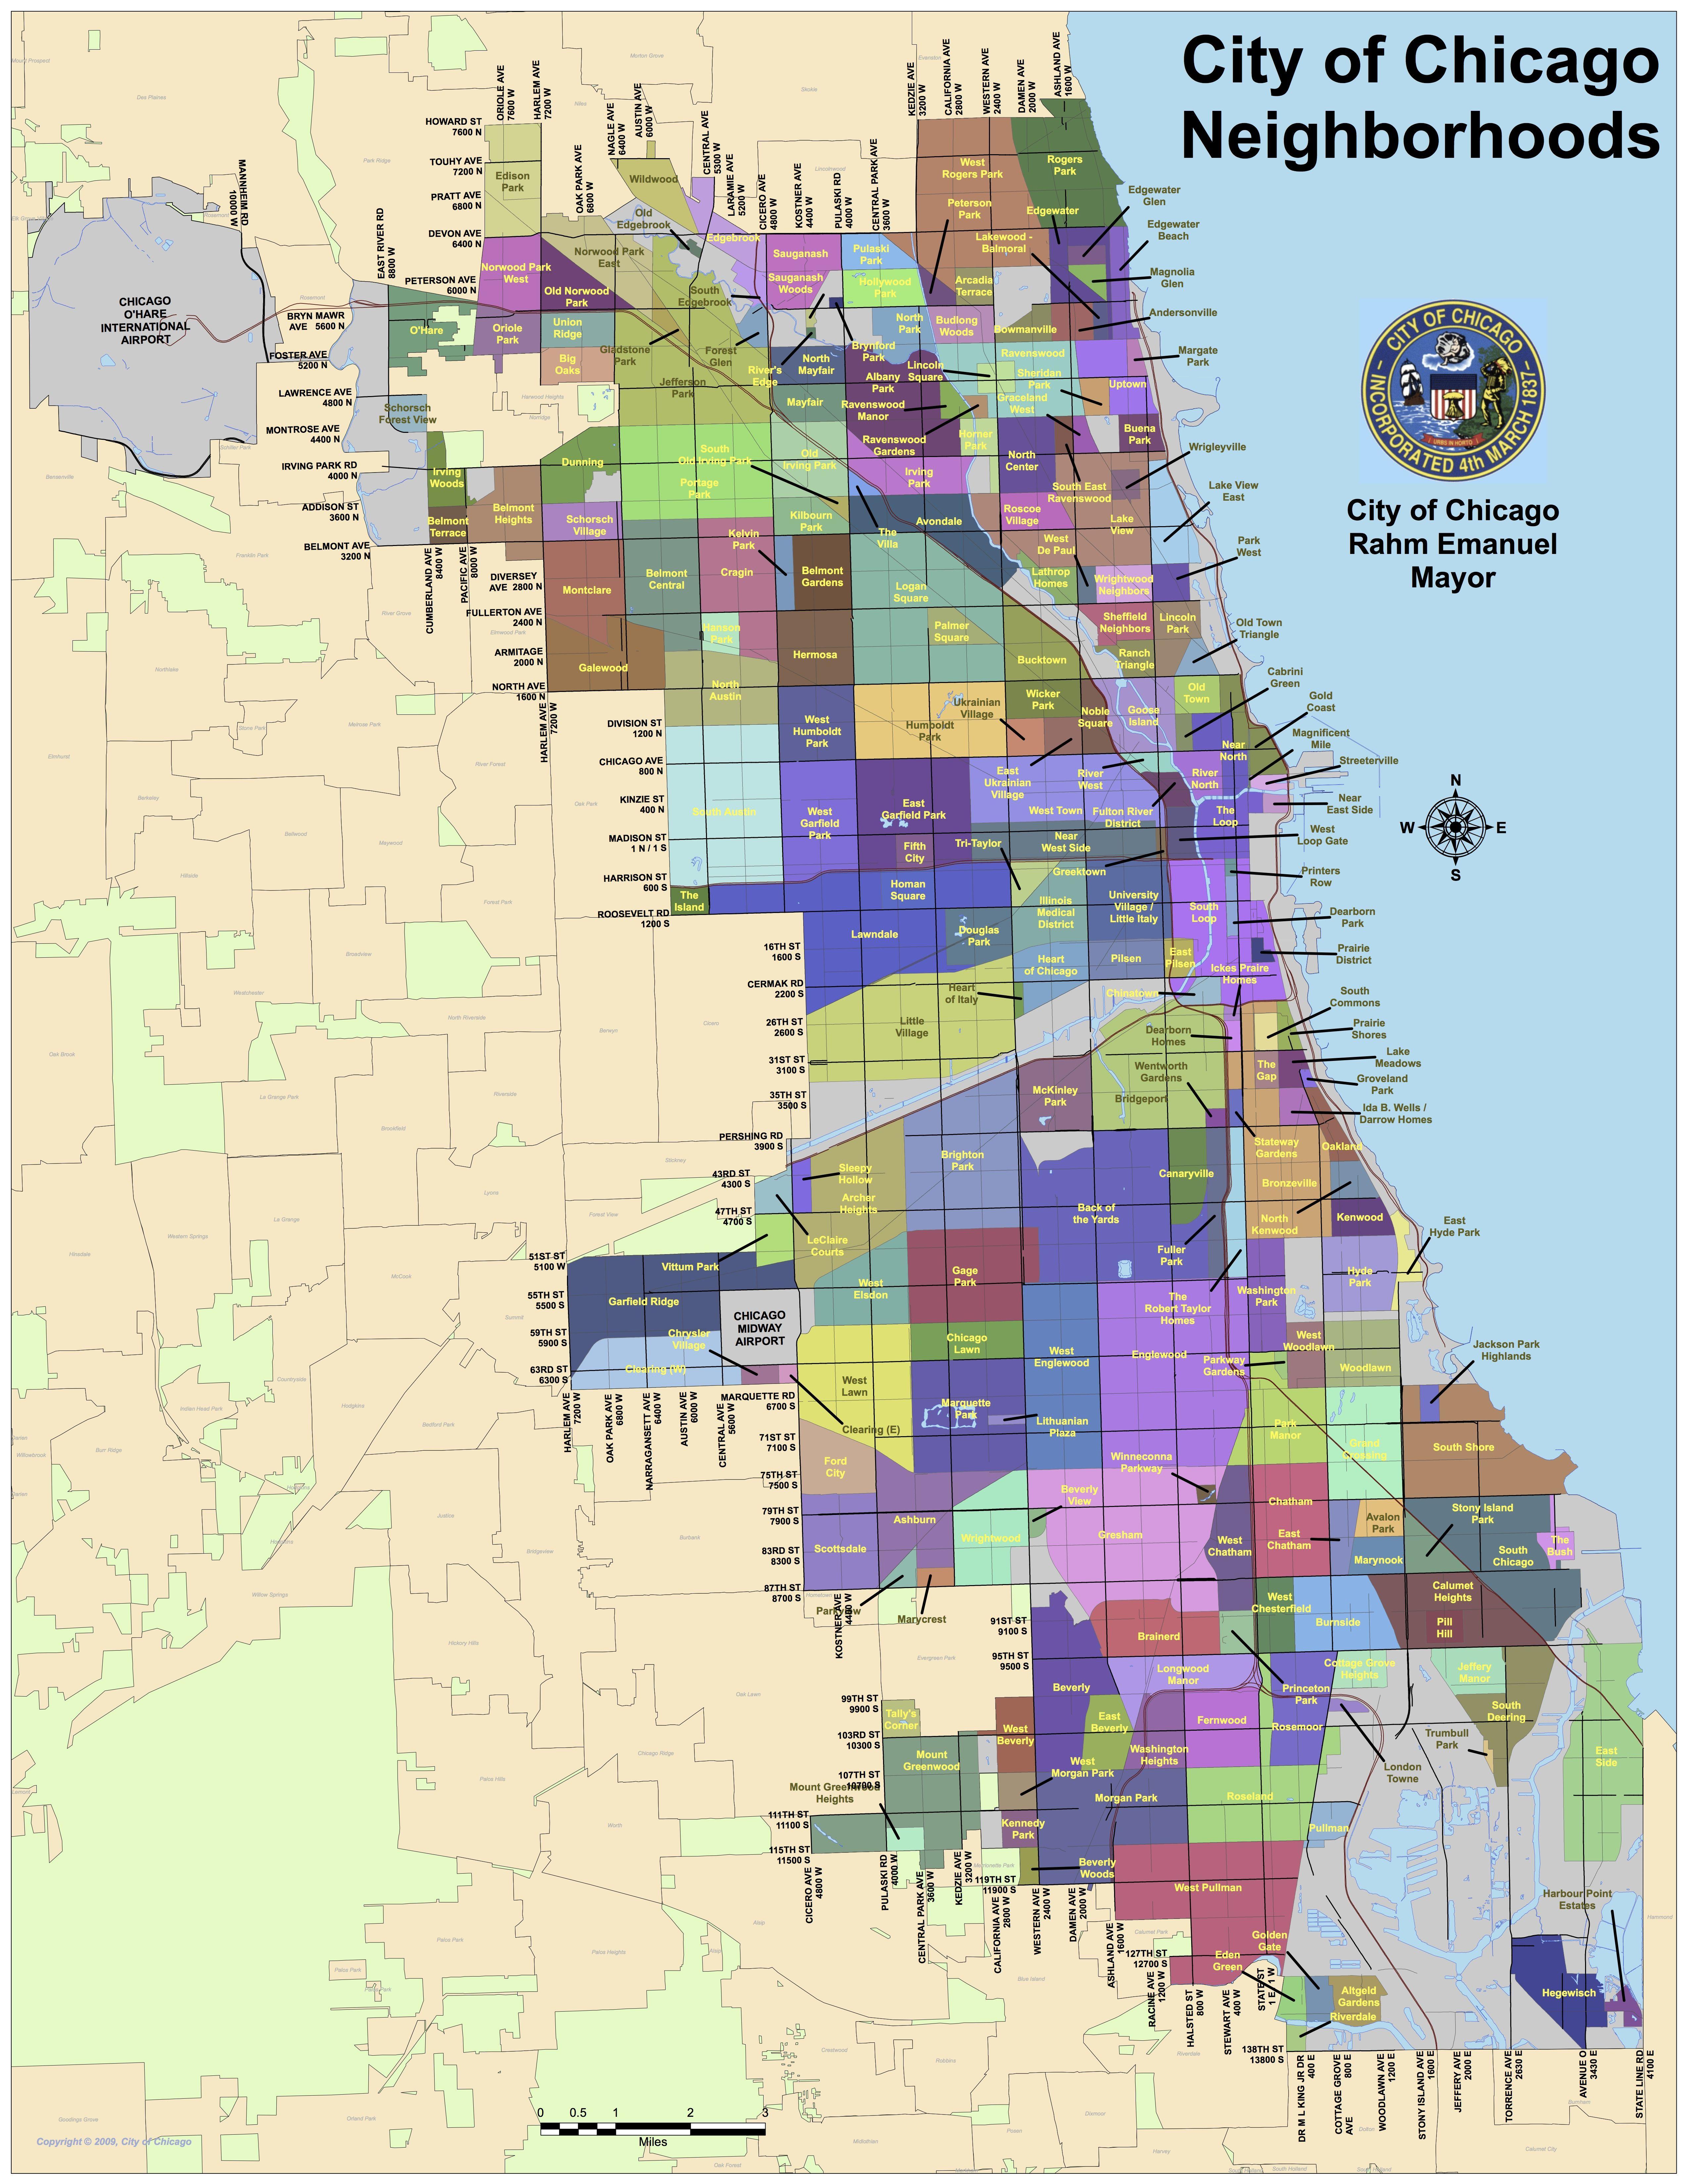 Neighborhood Map Of Chicago Adriftskateshop - Chicago map neighborhoods streets